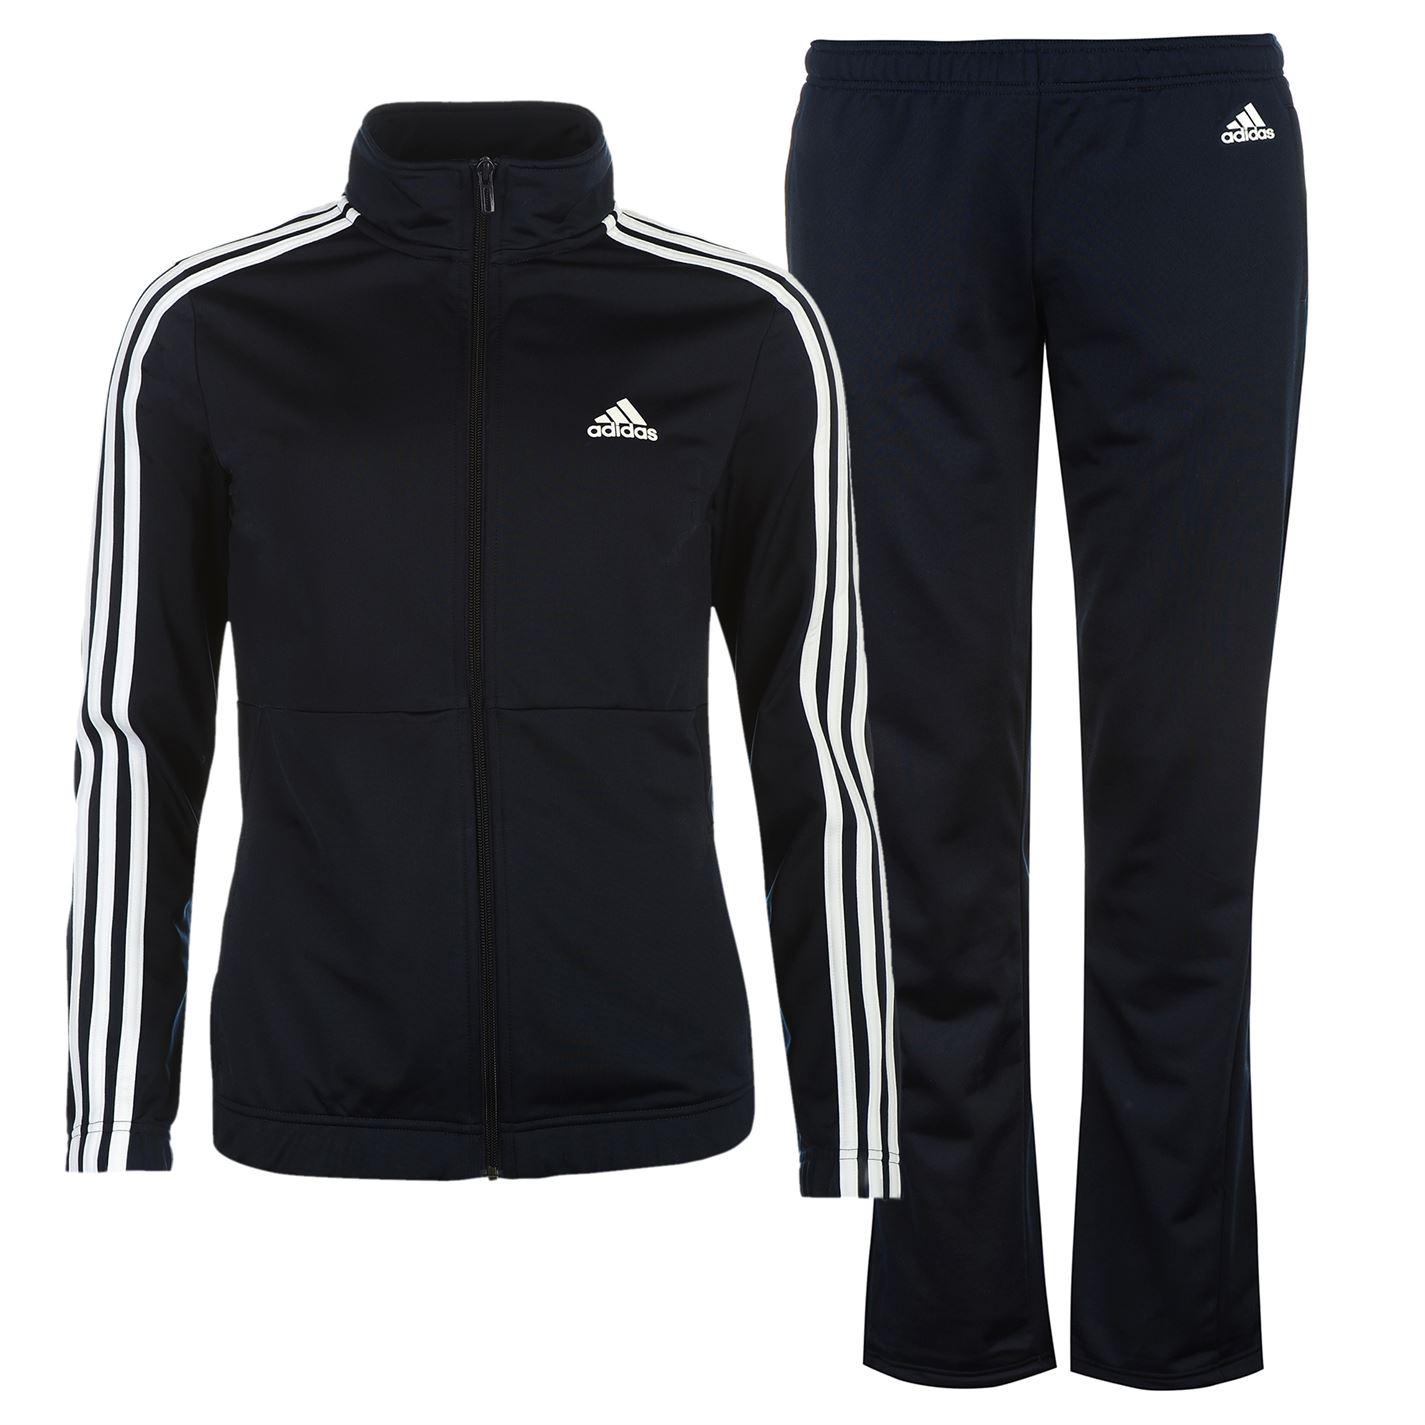 adidas Back 2 Basics 3 Stripes Tracksuit Ladies